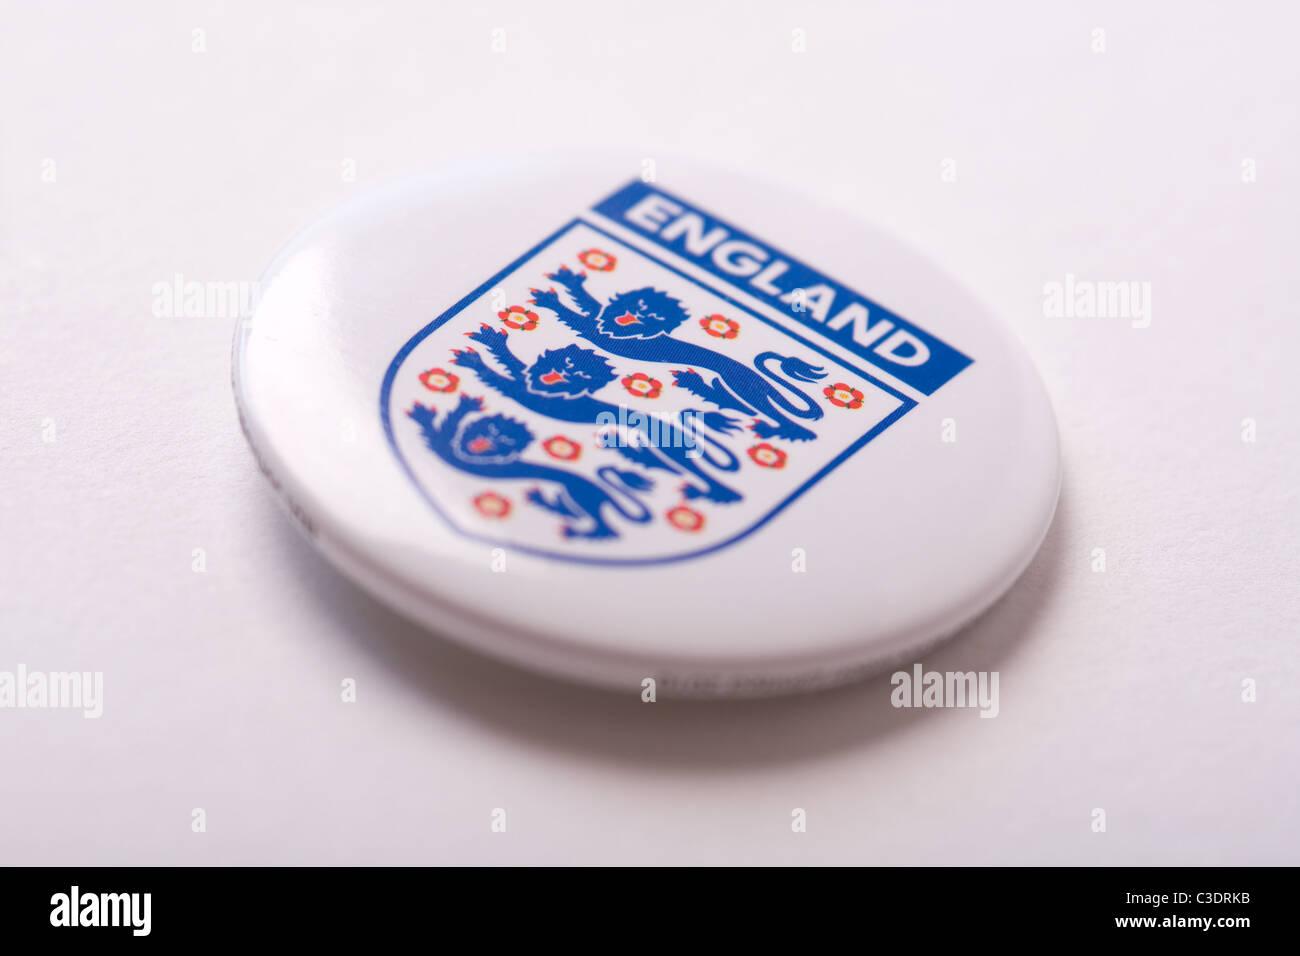 England Football Fan Badge - Stock Image